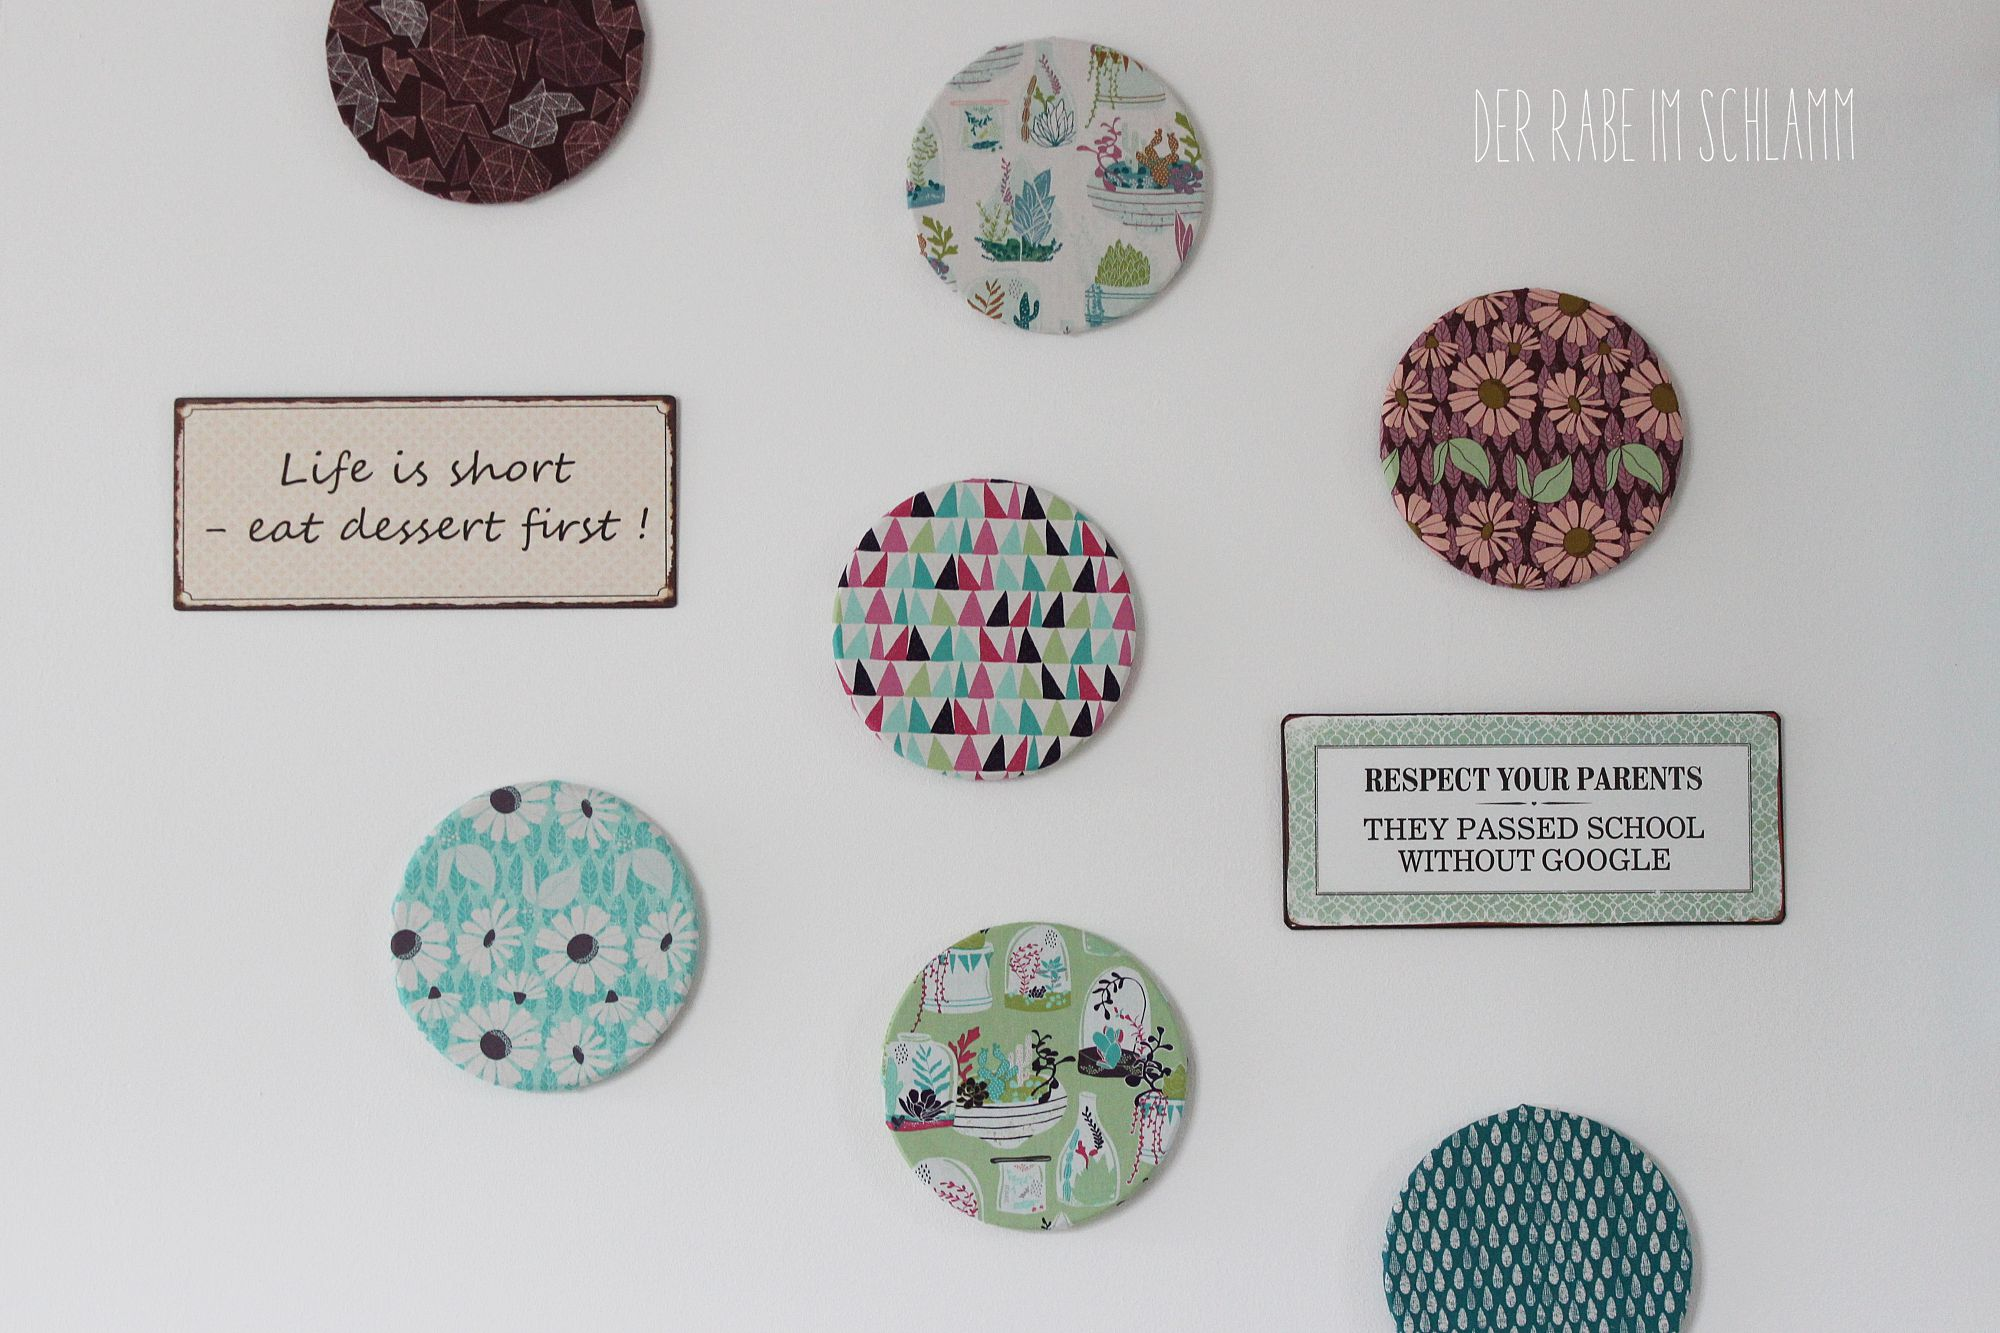 Pinnwand, Stoff, Succulence Fabrics, Der Rabe im Schlamm